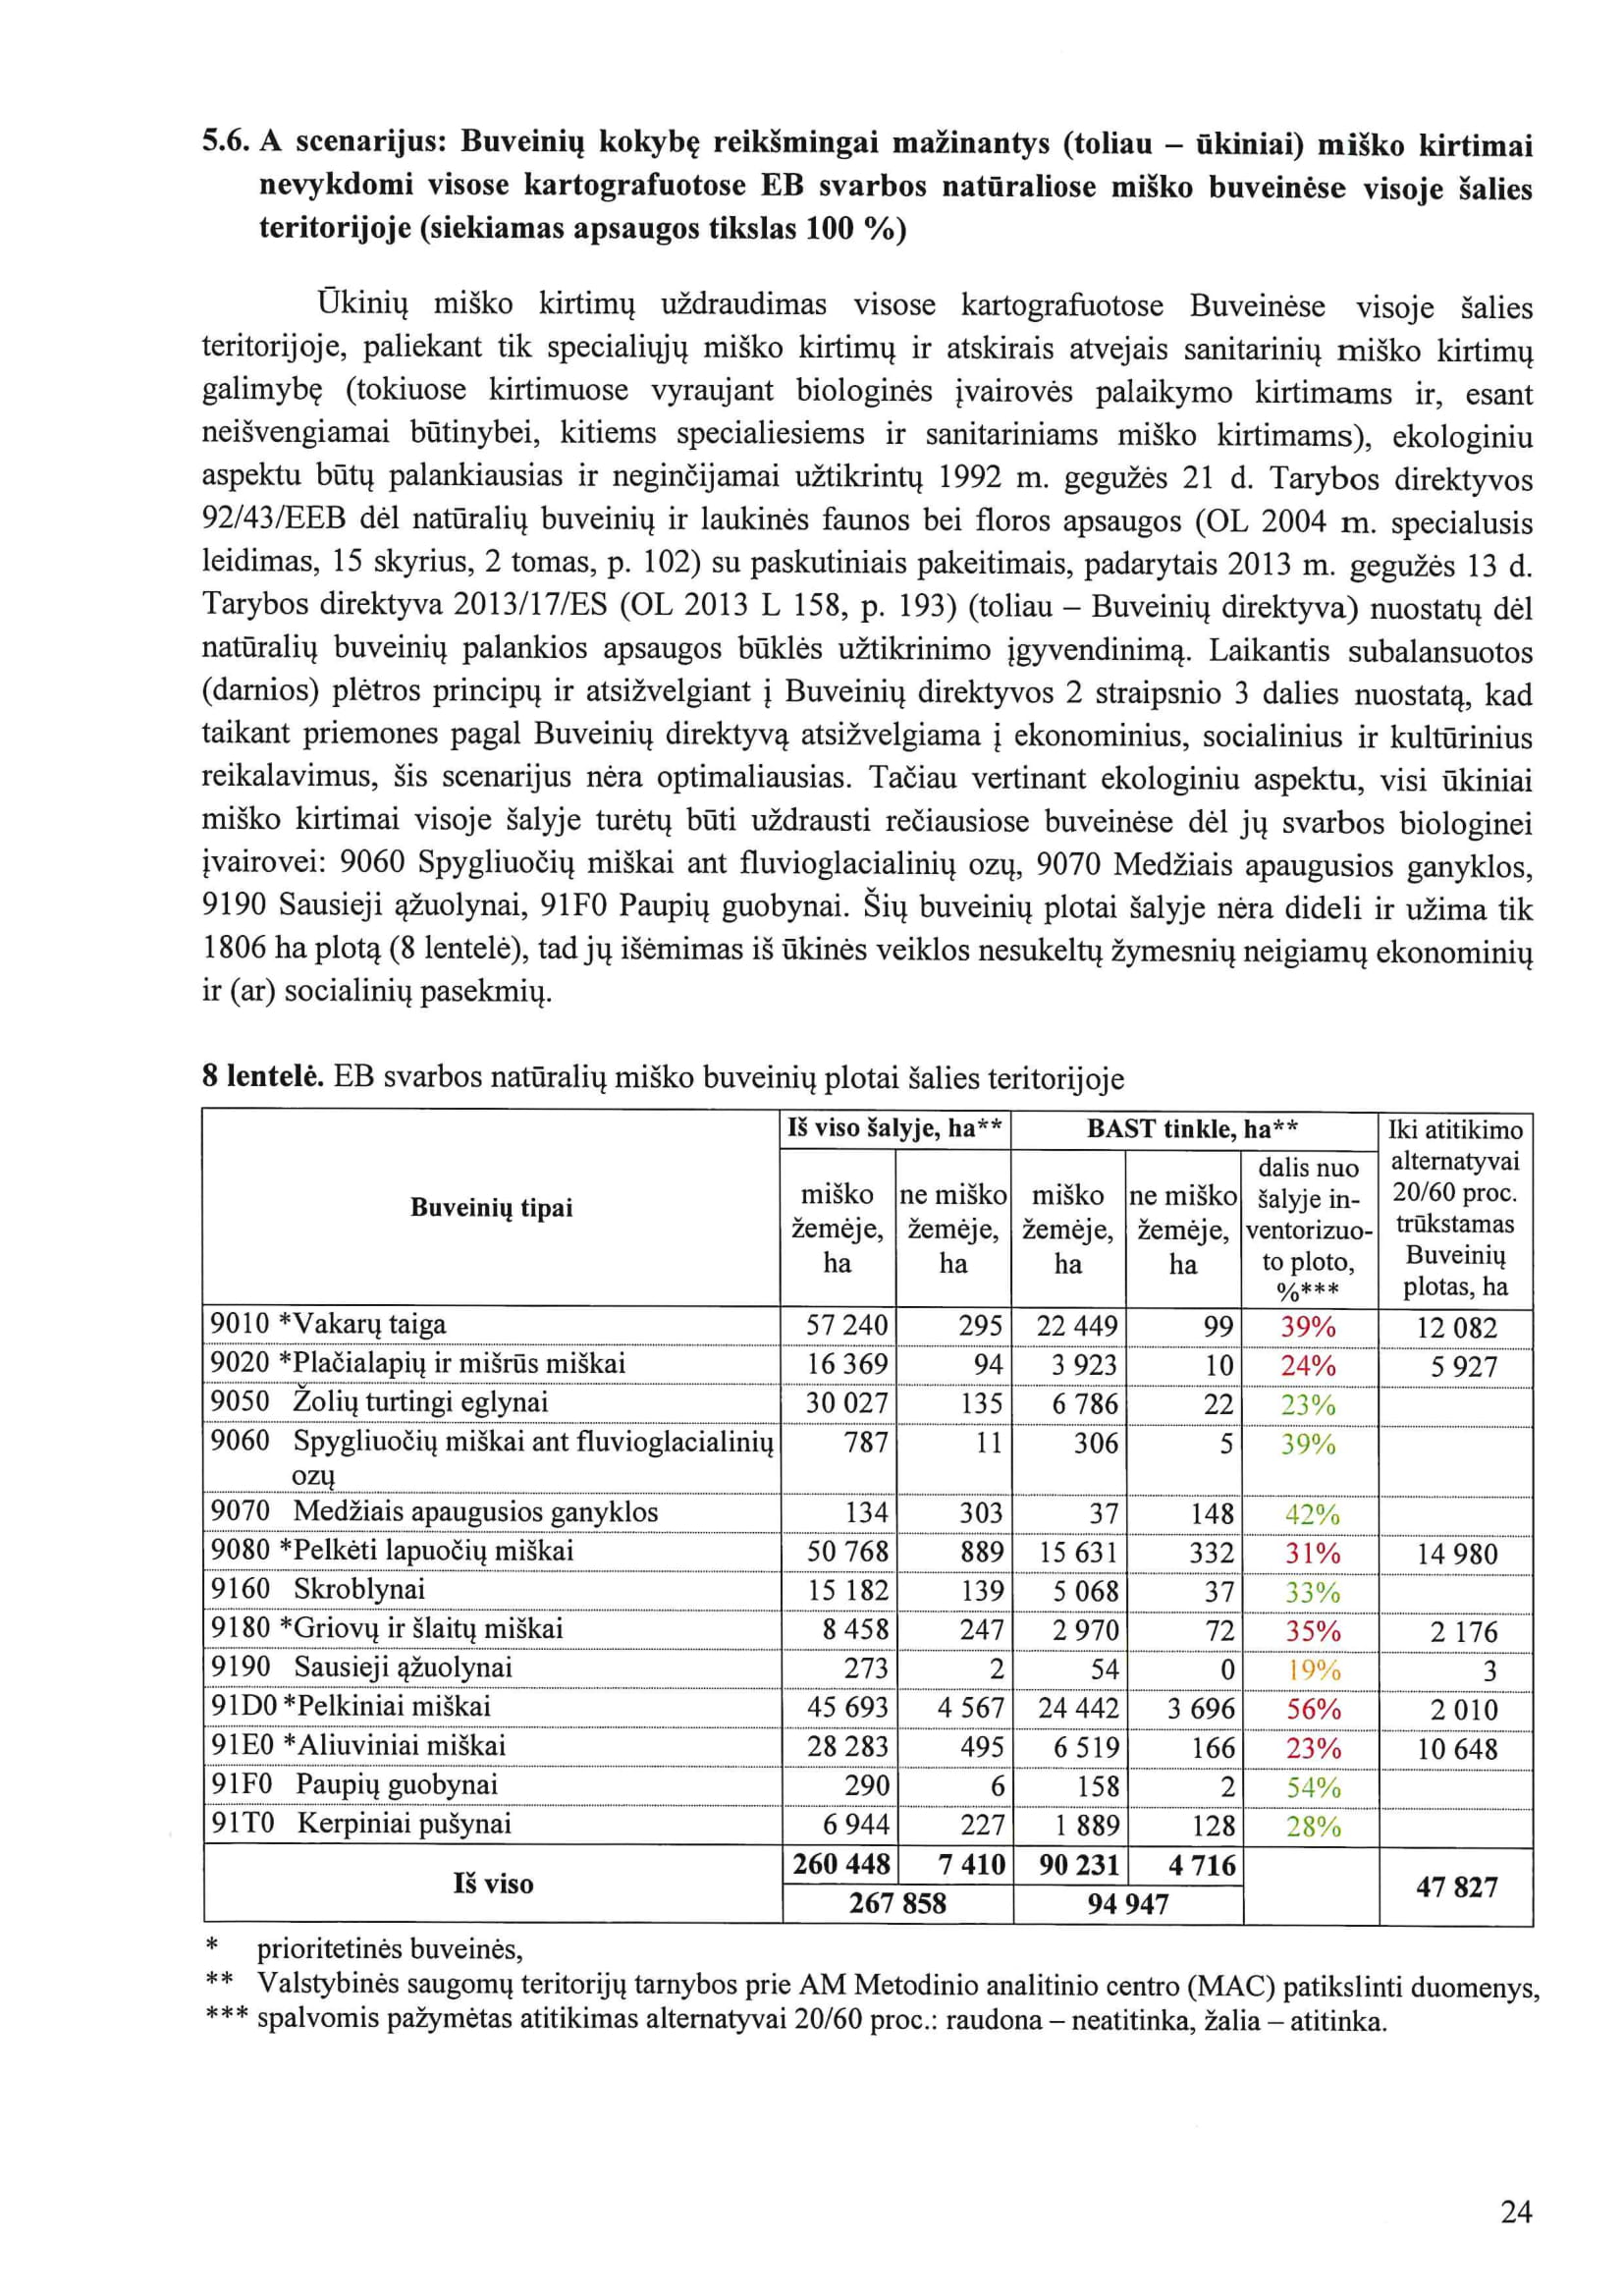 EB buveiniu Pazyma VMT VMU VSTT 2019.01.23 (su parasais)[38073]-24